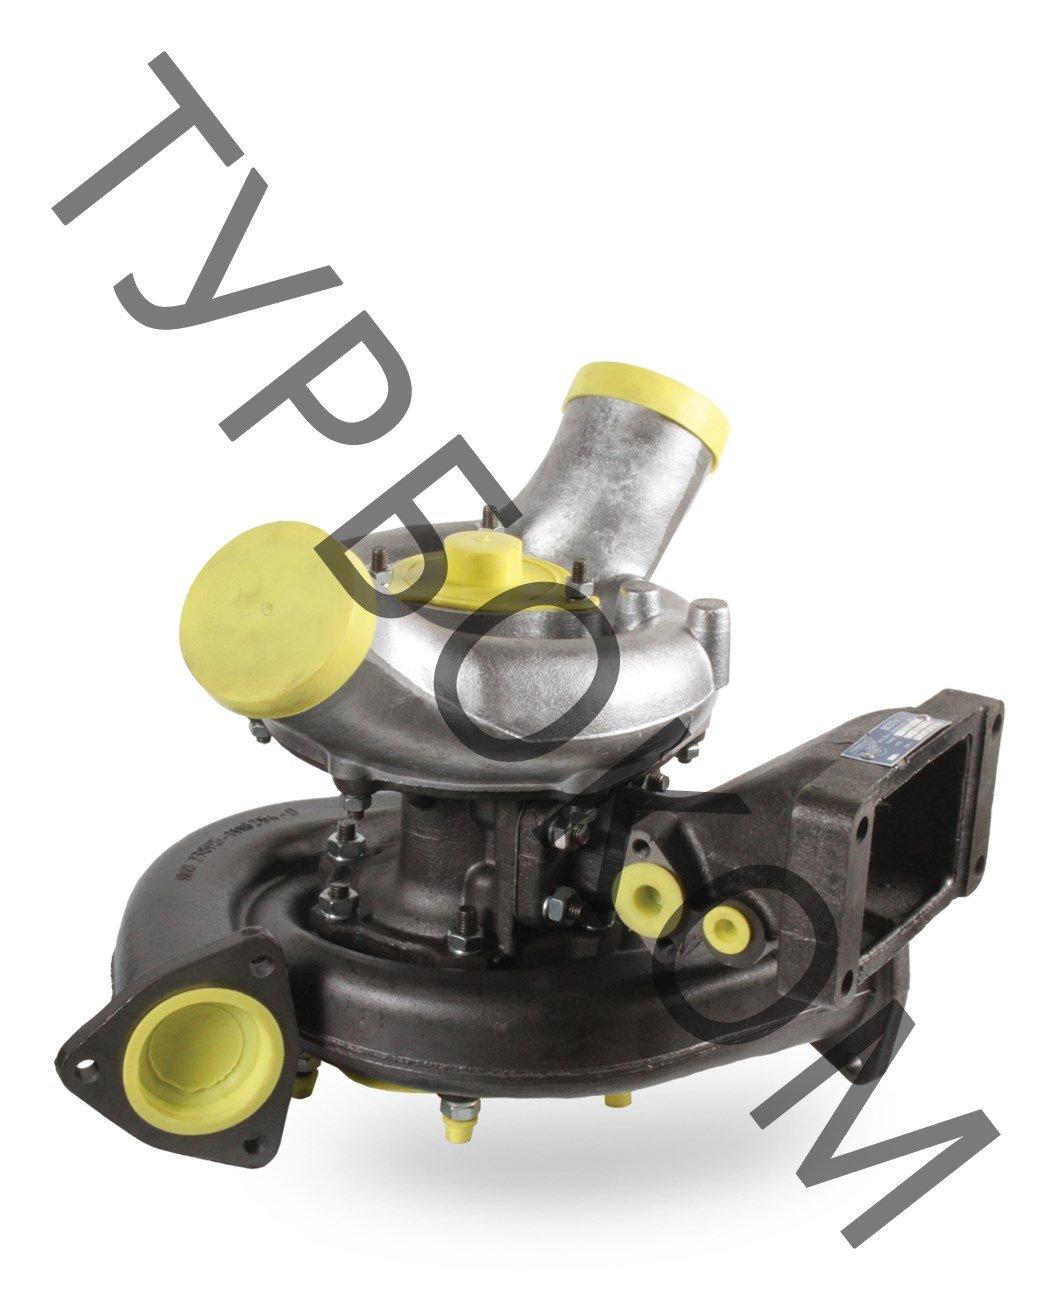 Турбокомпрессор ТКР-11-238НБ ЯМЗ-238 НД2/Л,Н